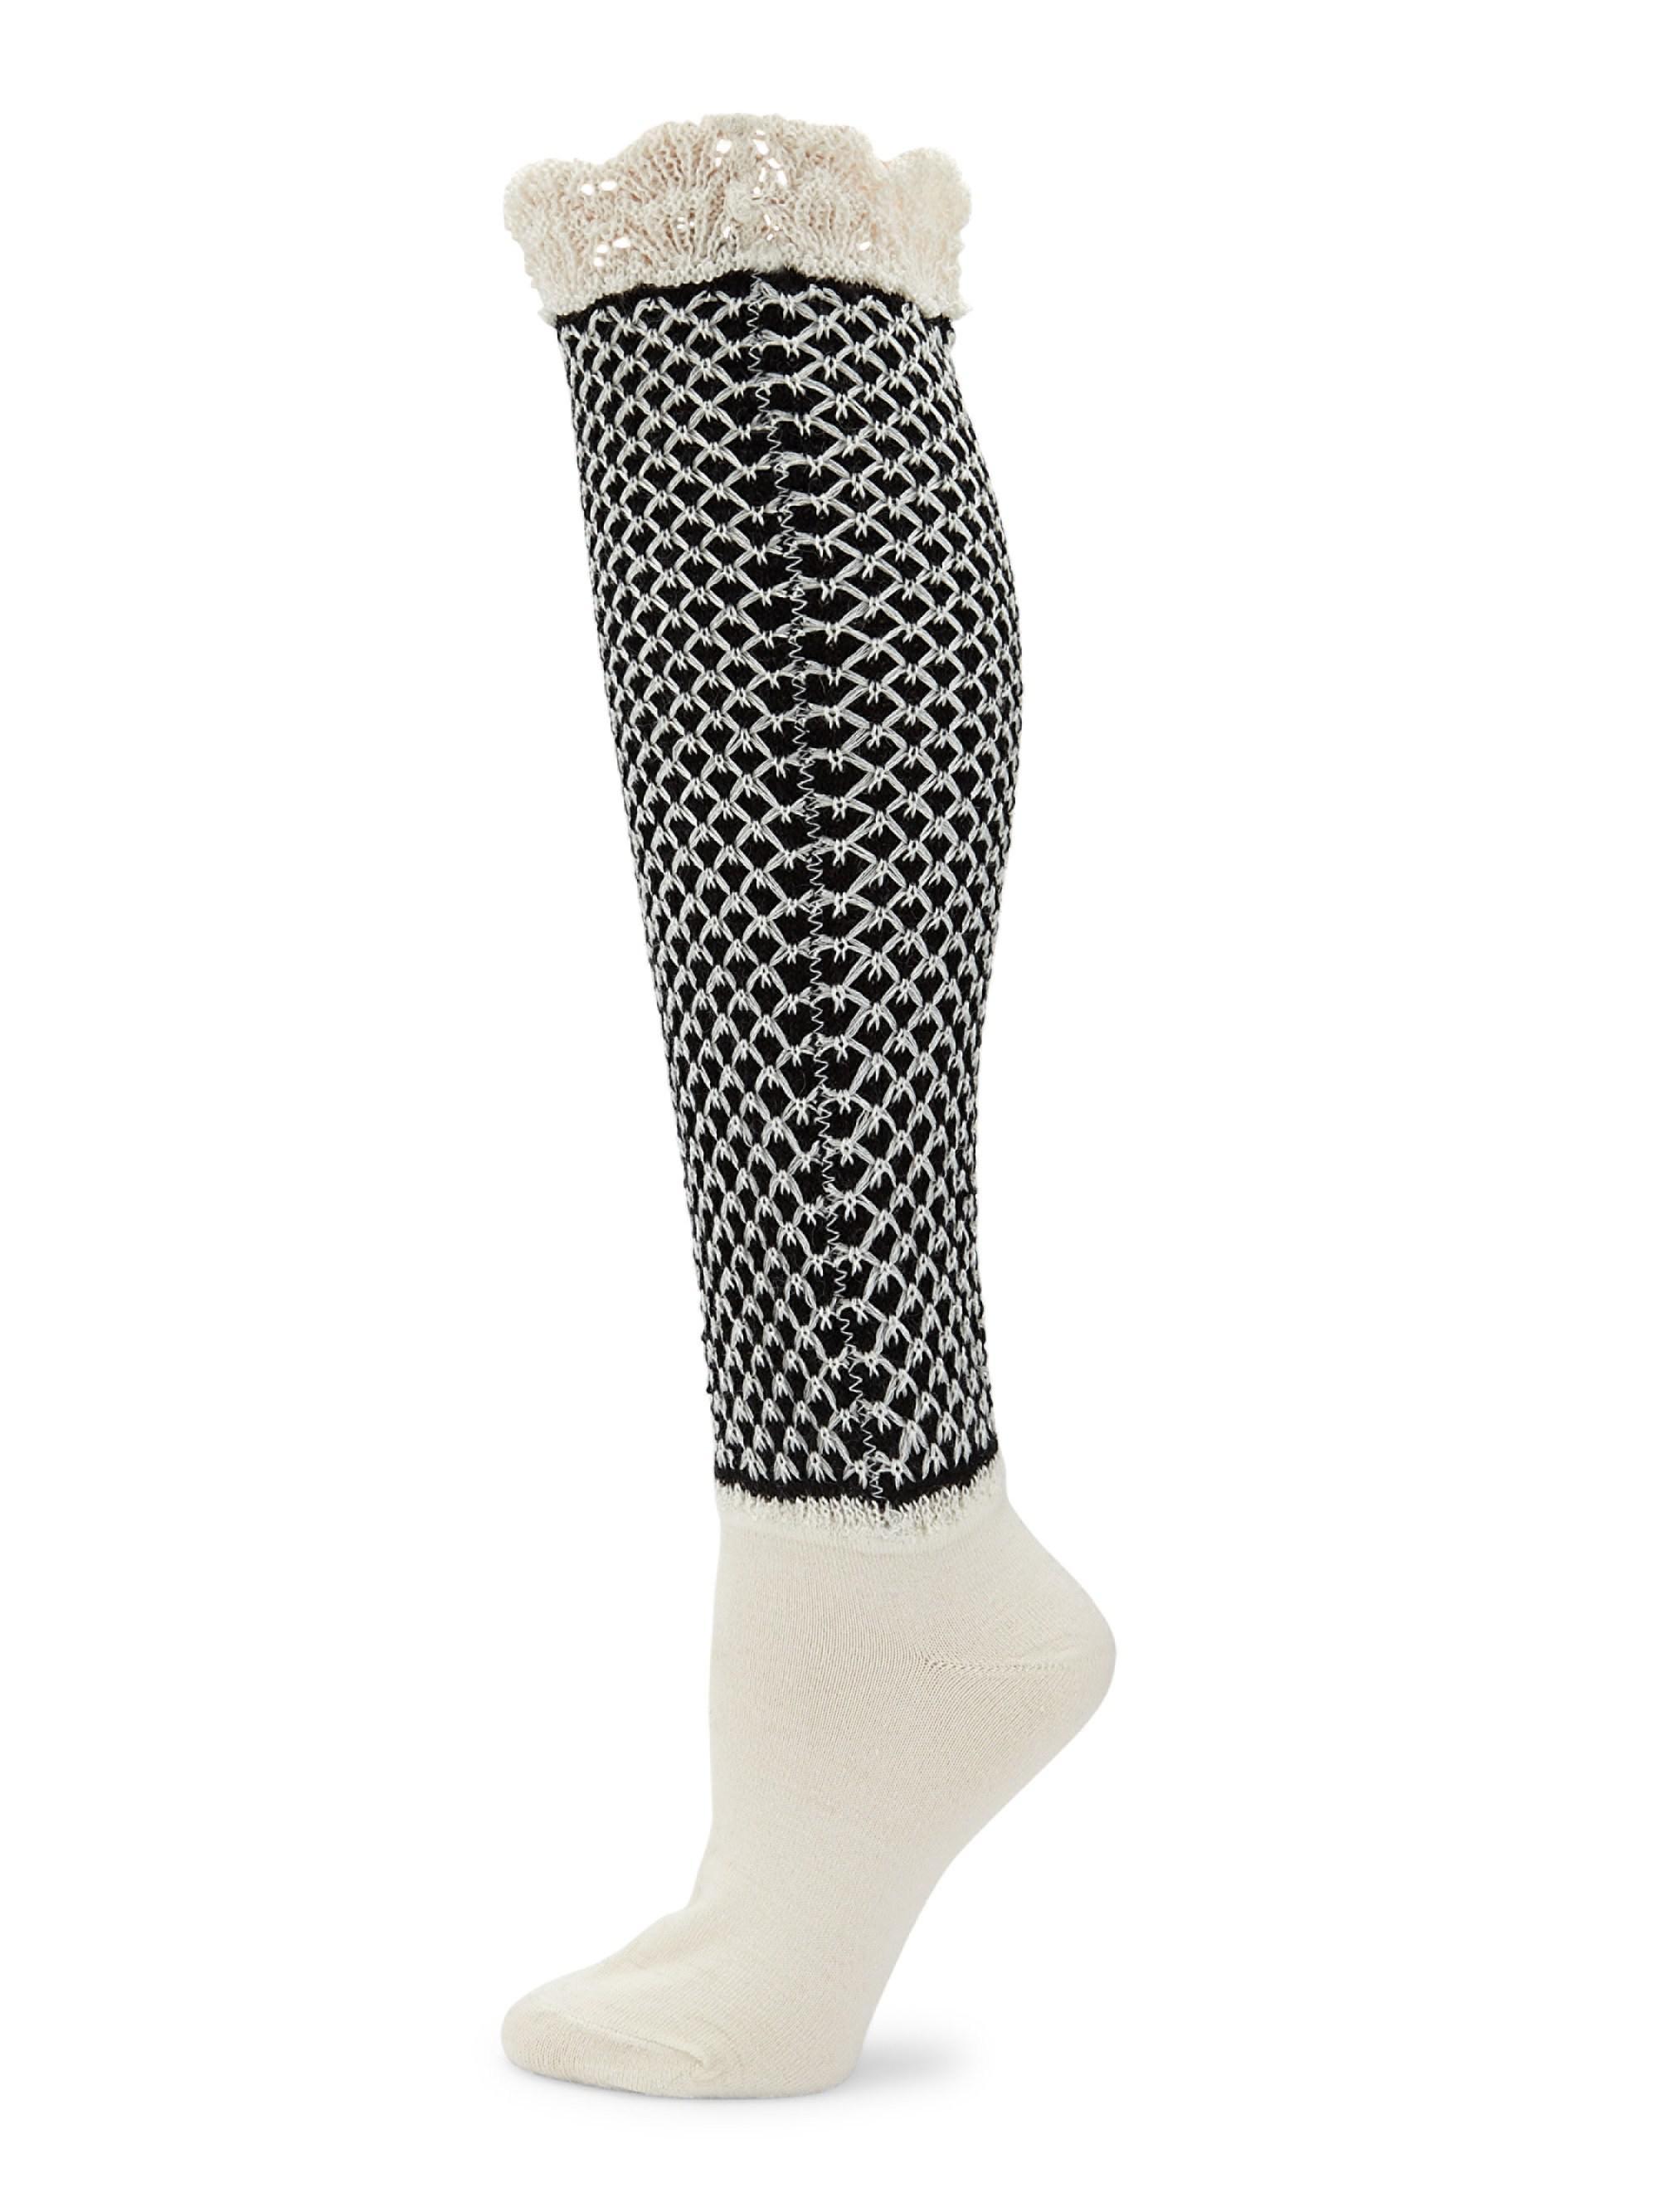 Natori Voile Boot Socks Itj0JK6